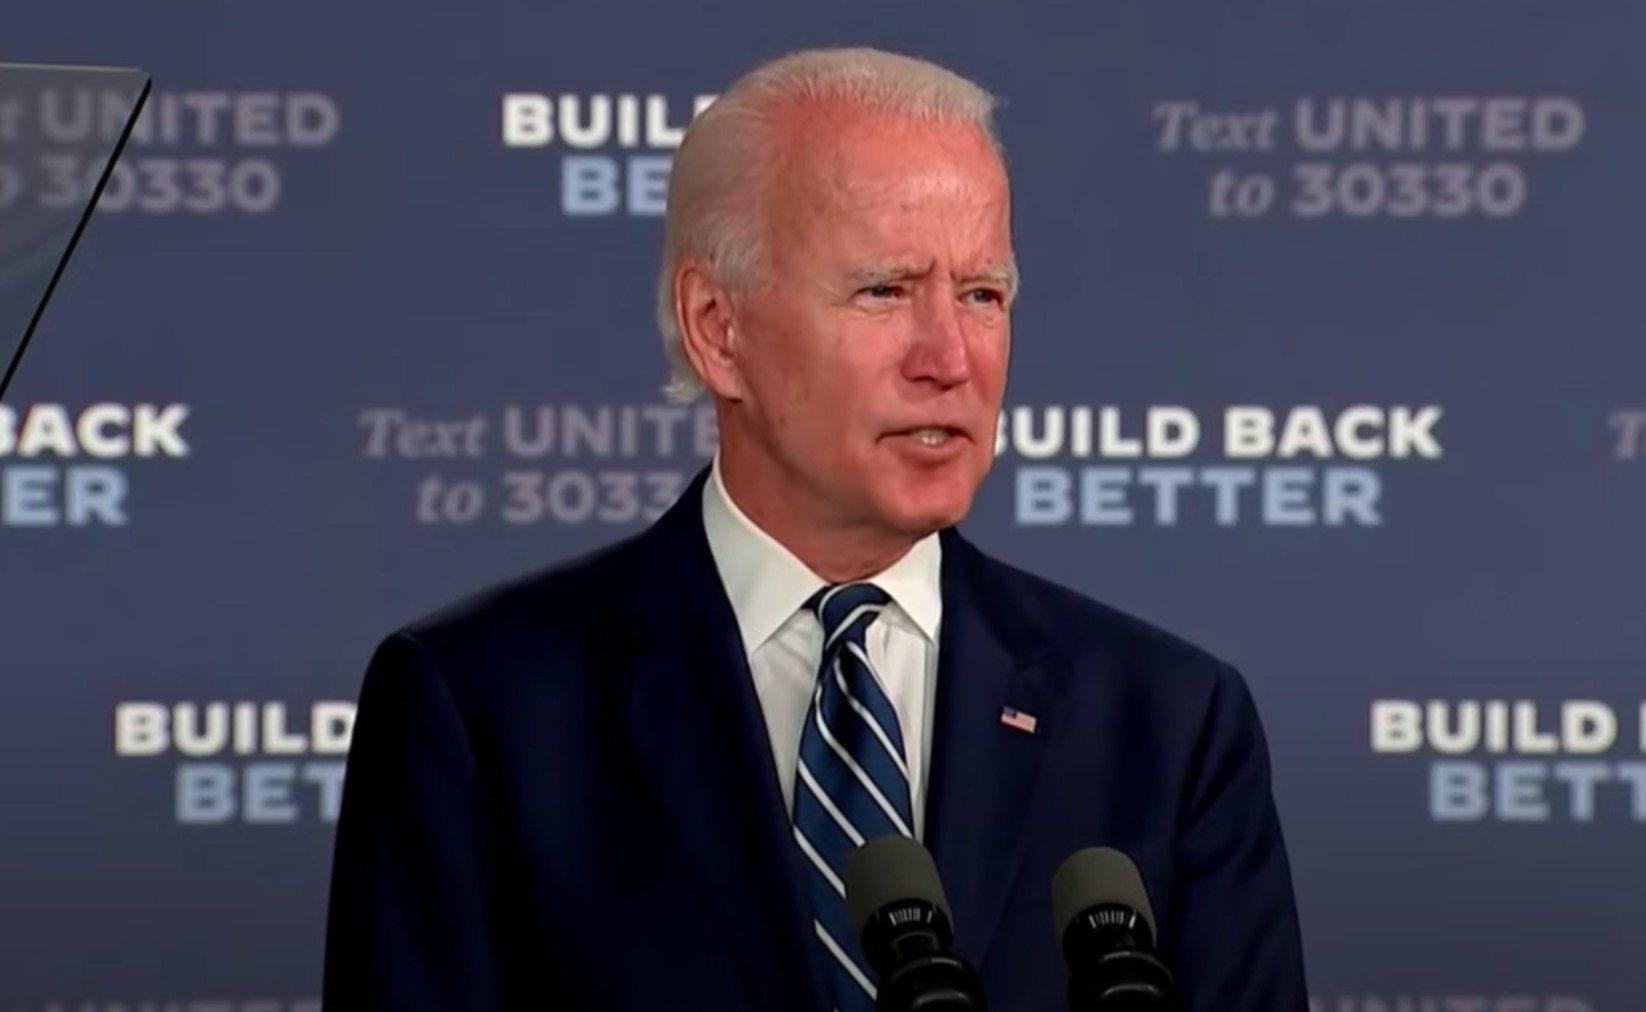 Joe Biden Occupational Therapy 2020